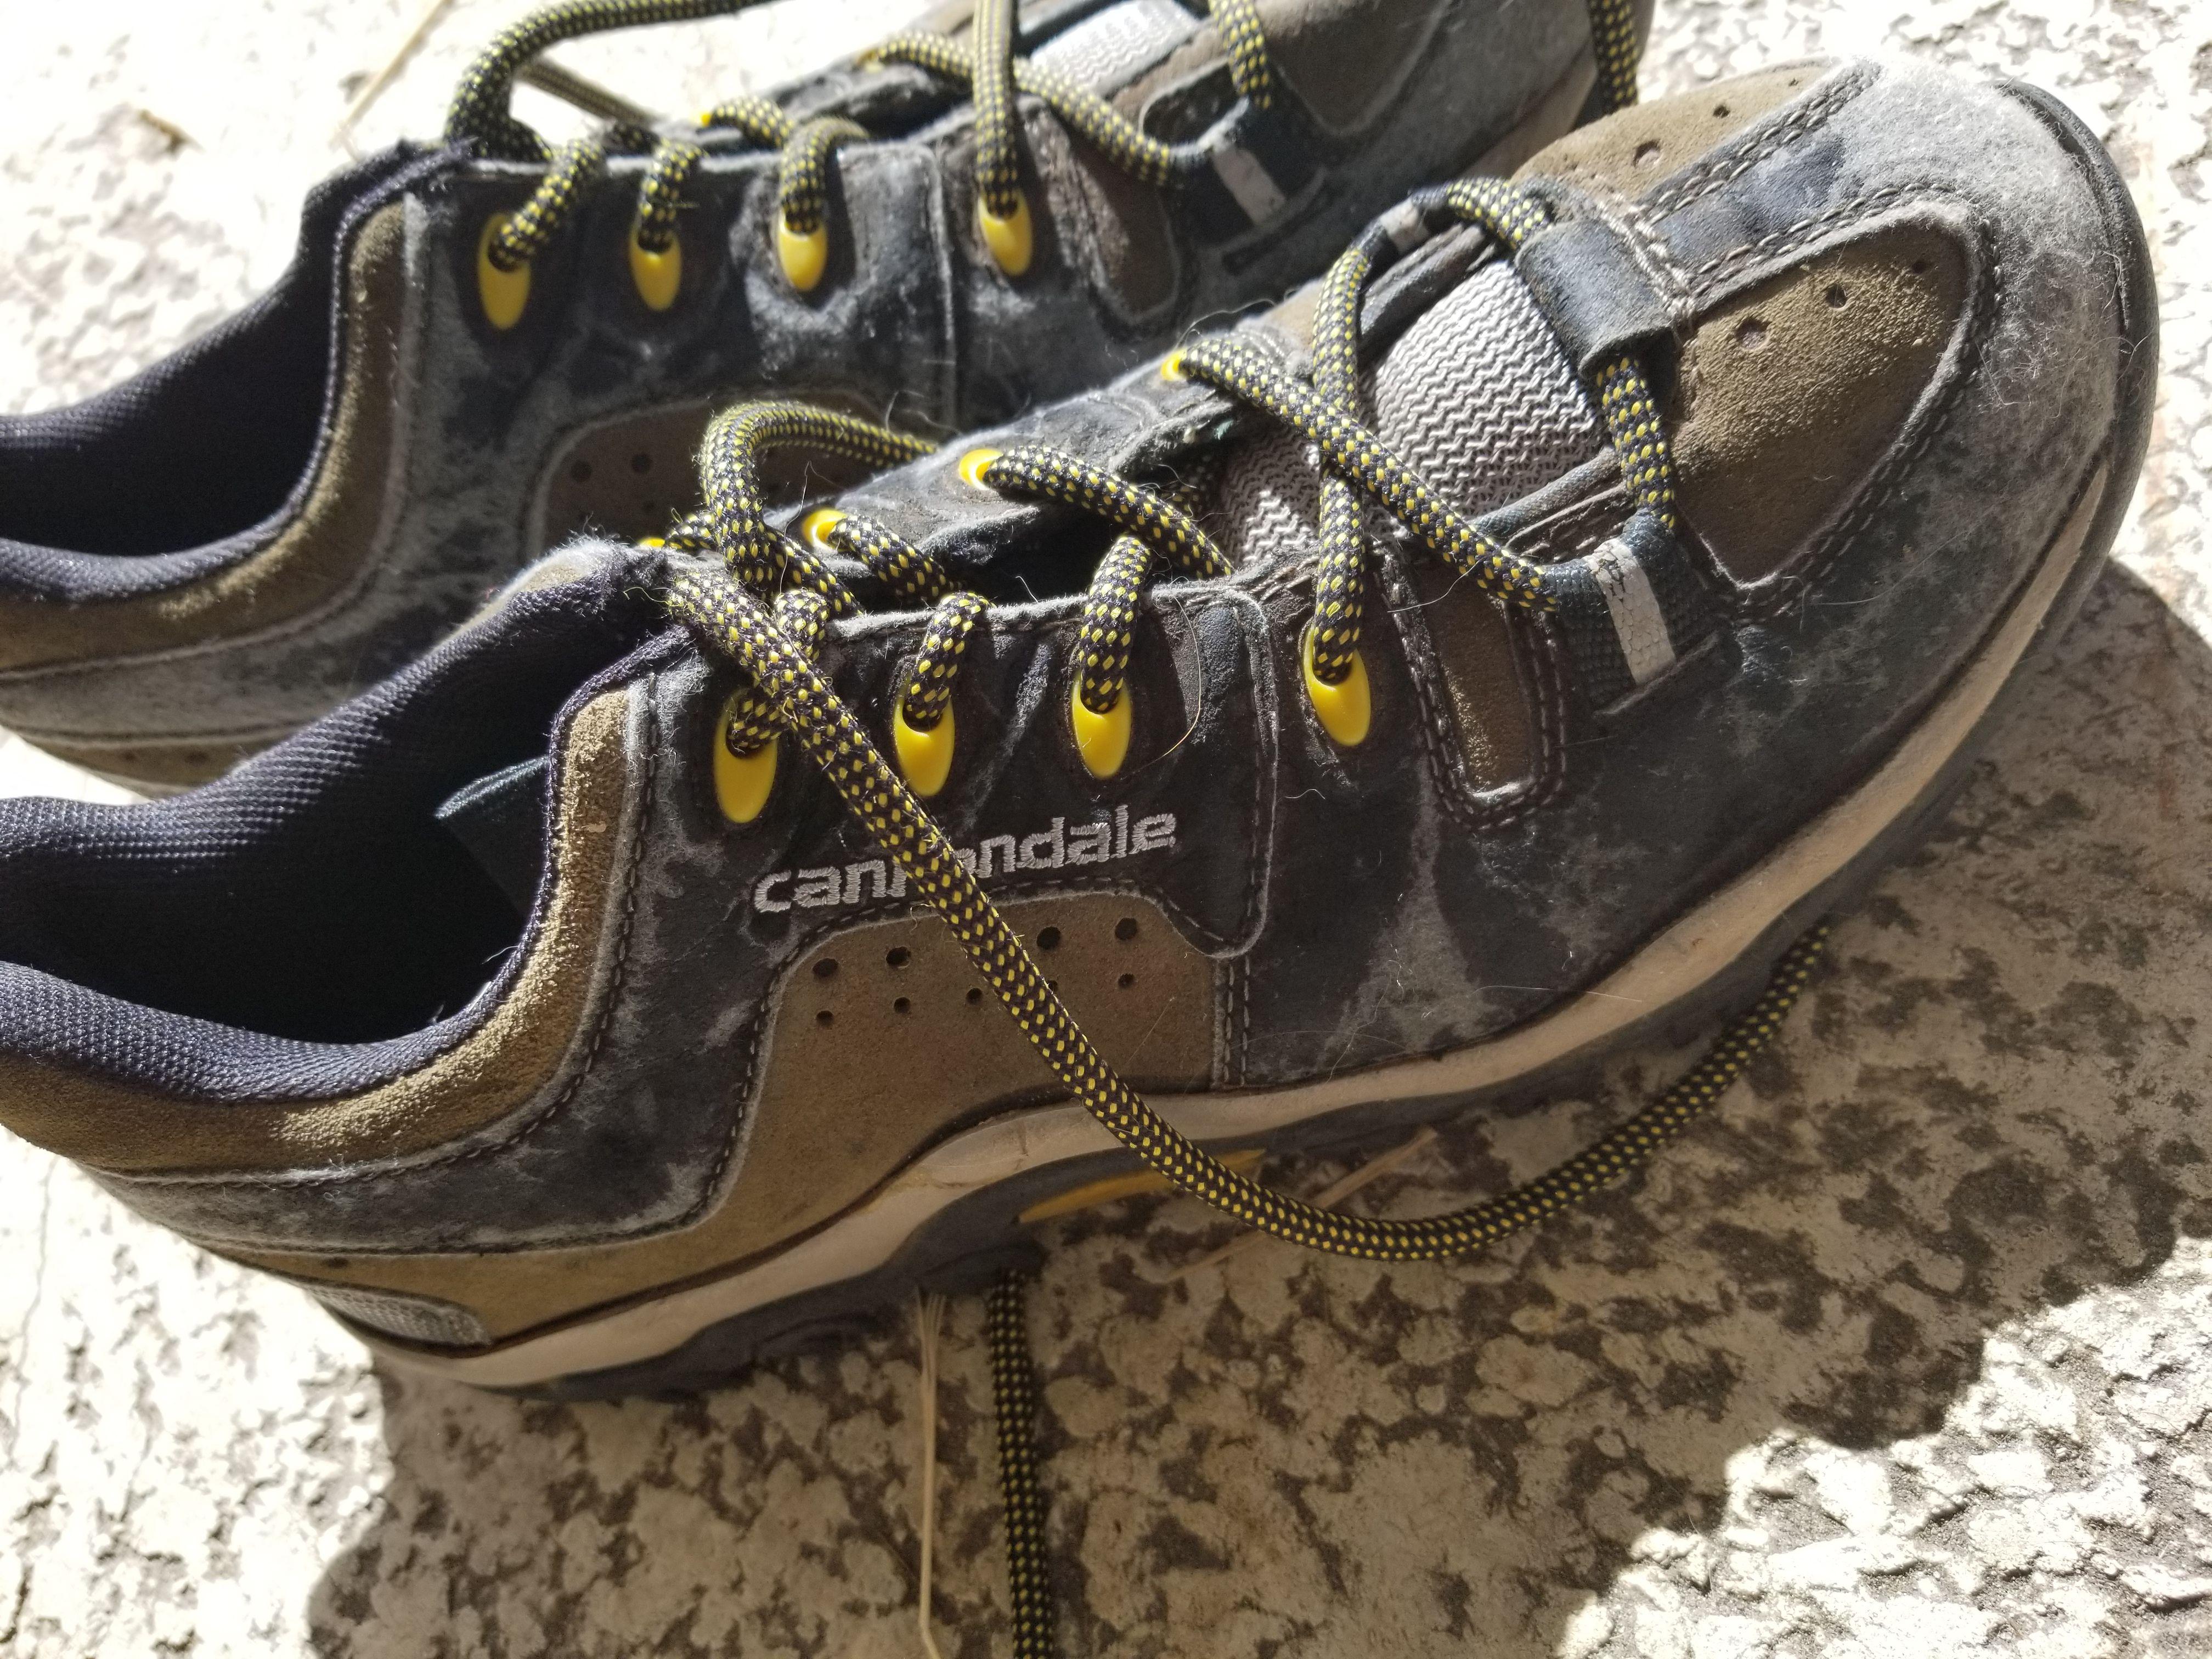 Cannondale Mountain Biking Shoes